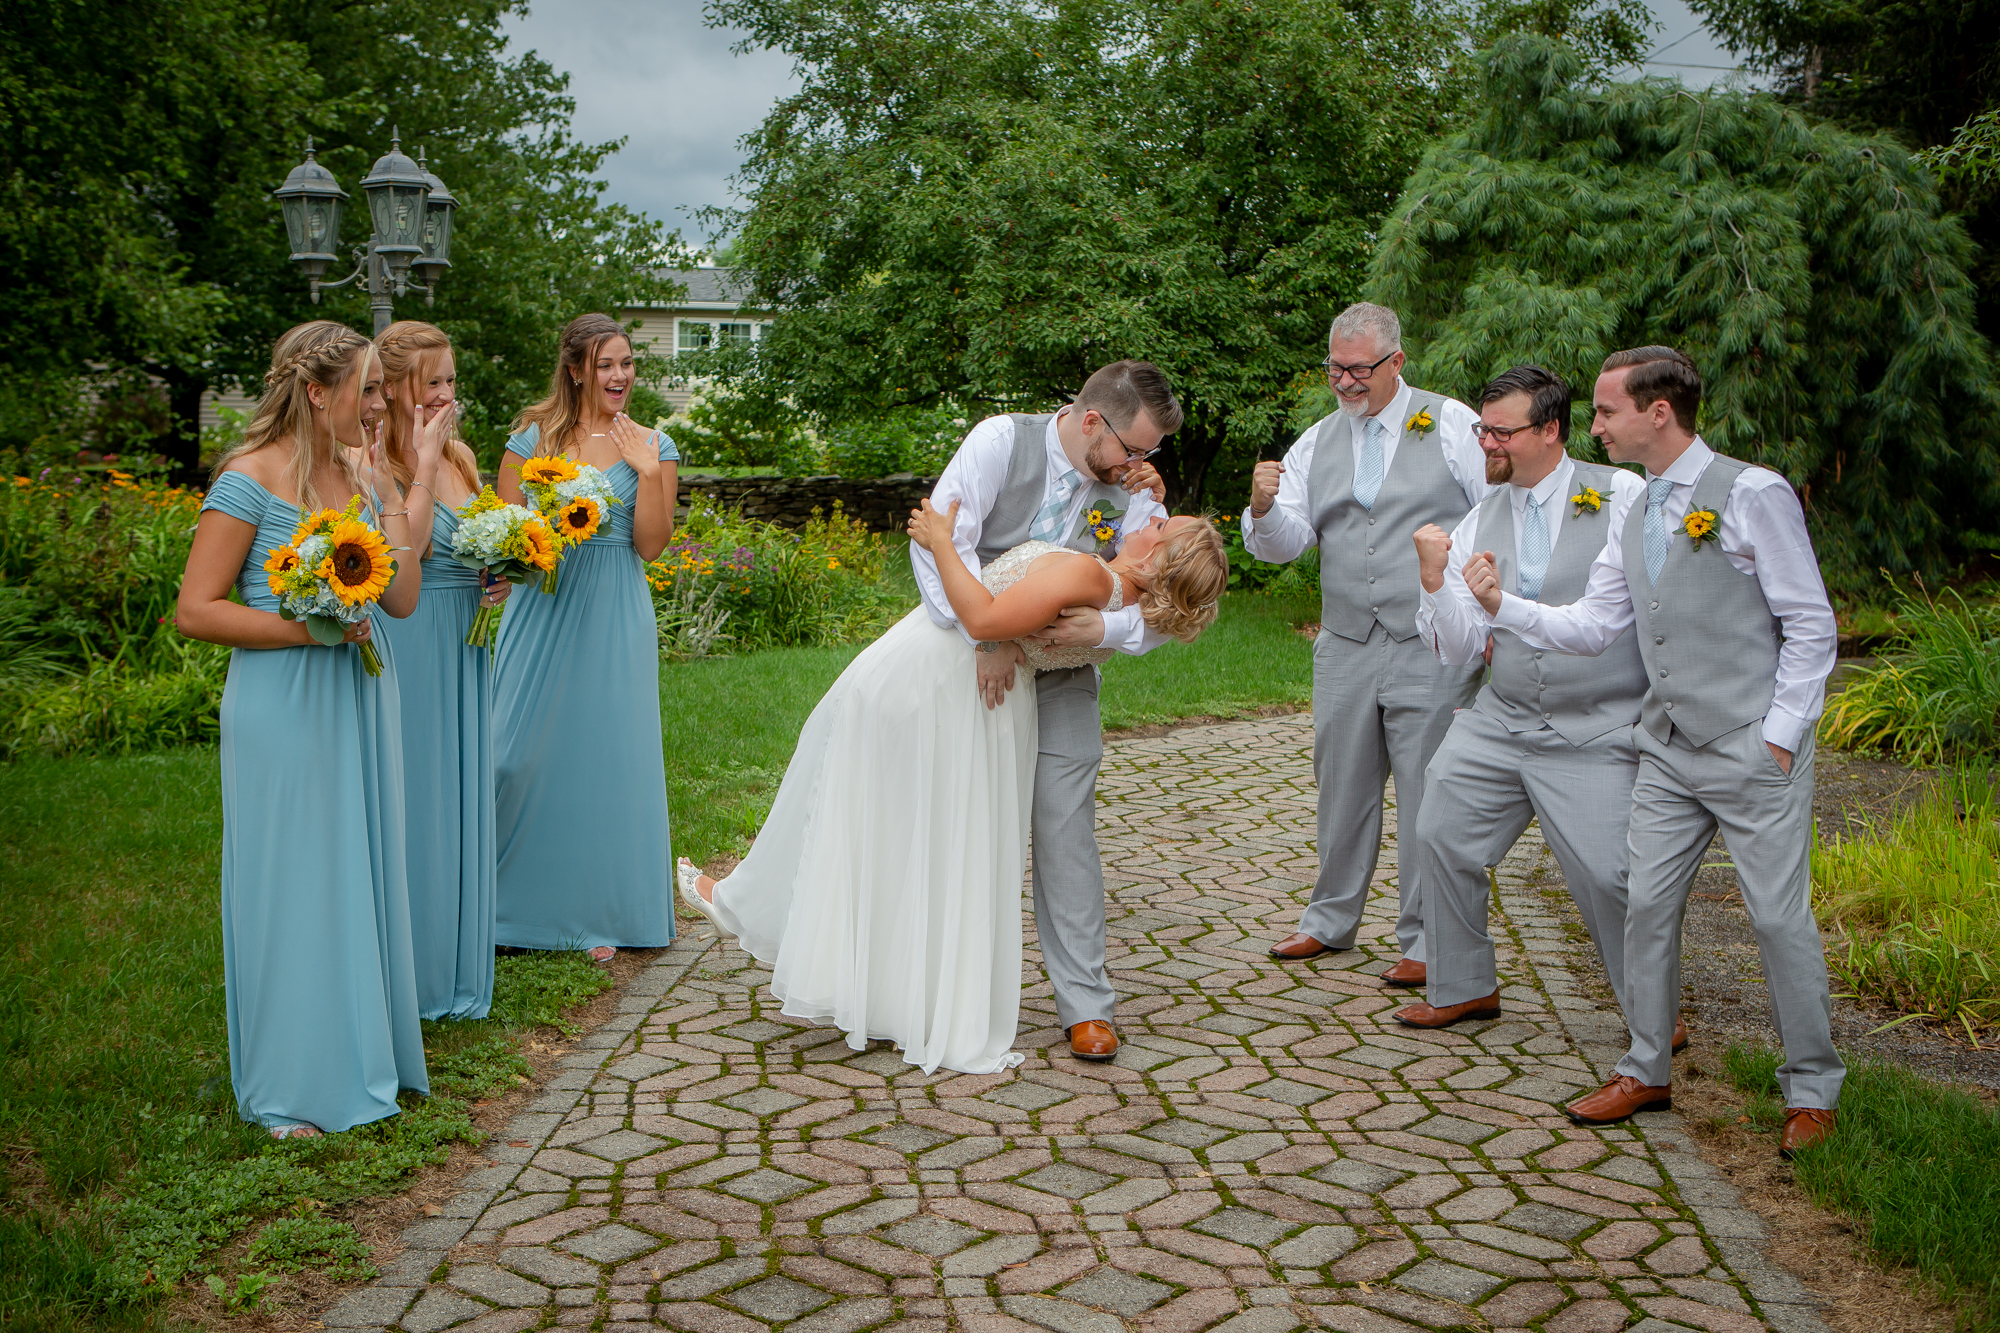 Wedding-Carriage-House-Oneonta-NY-0728.jpg